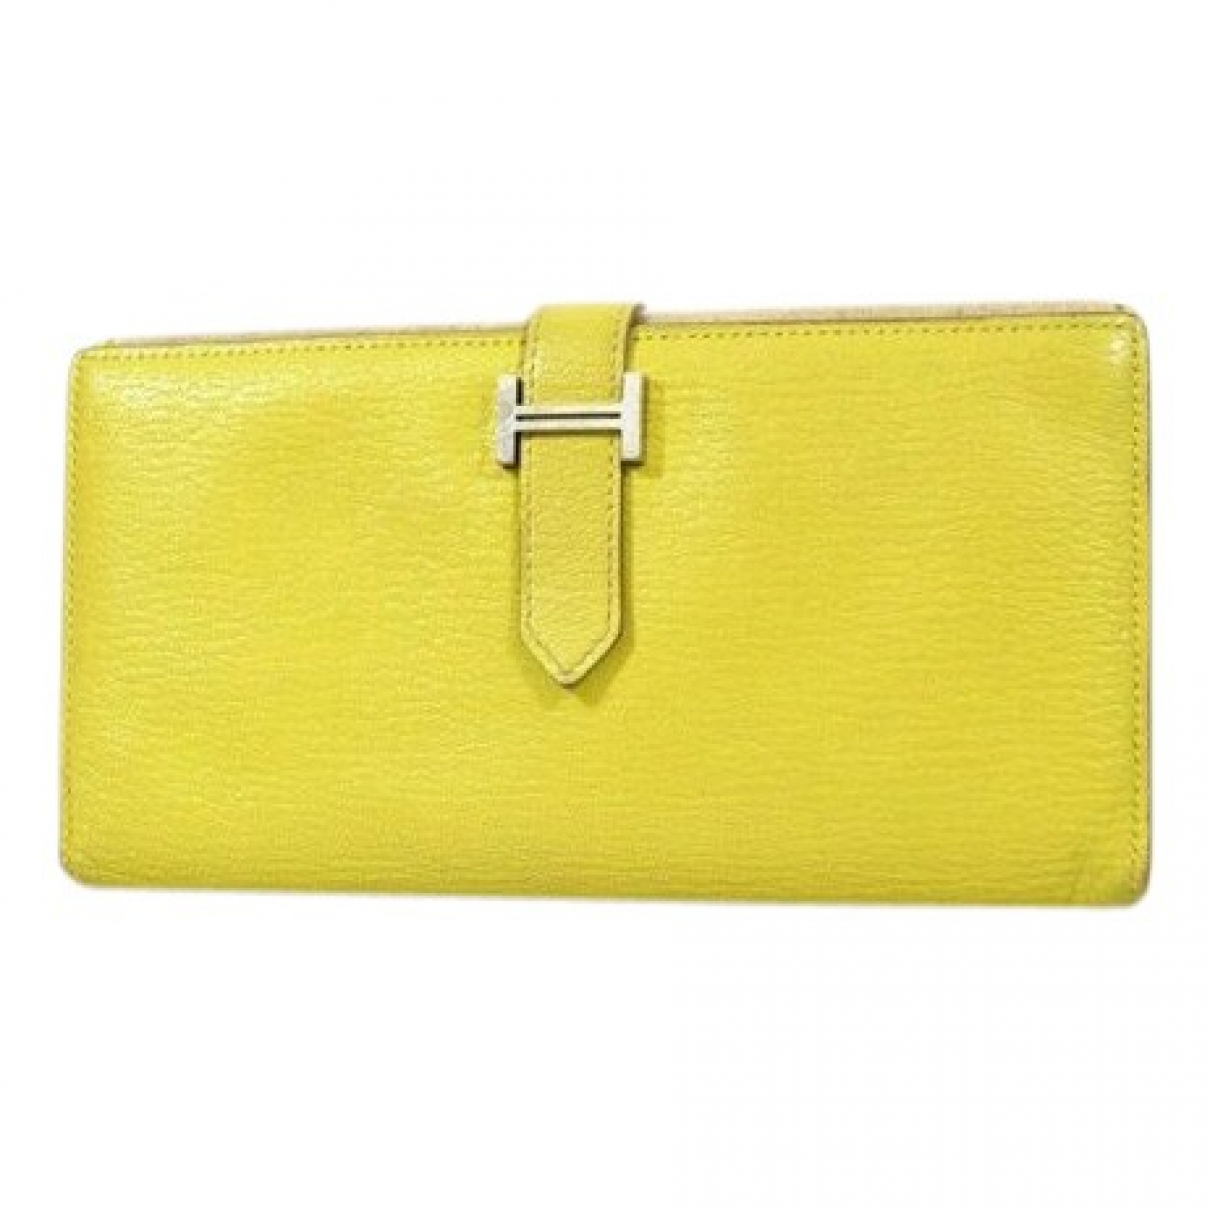 Hermes - Portefeuille Bearn pour femme en cuir - jaune